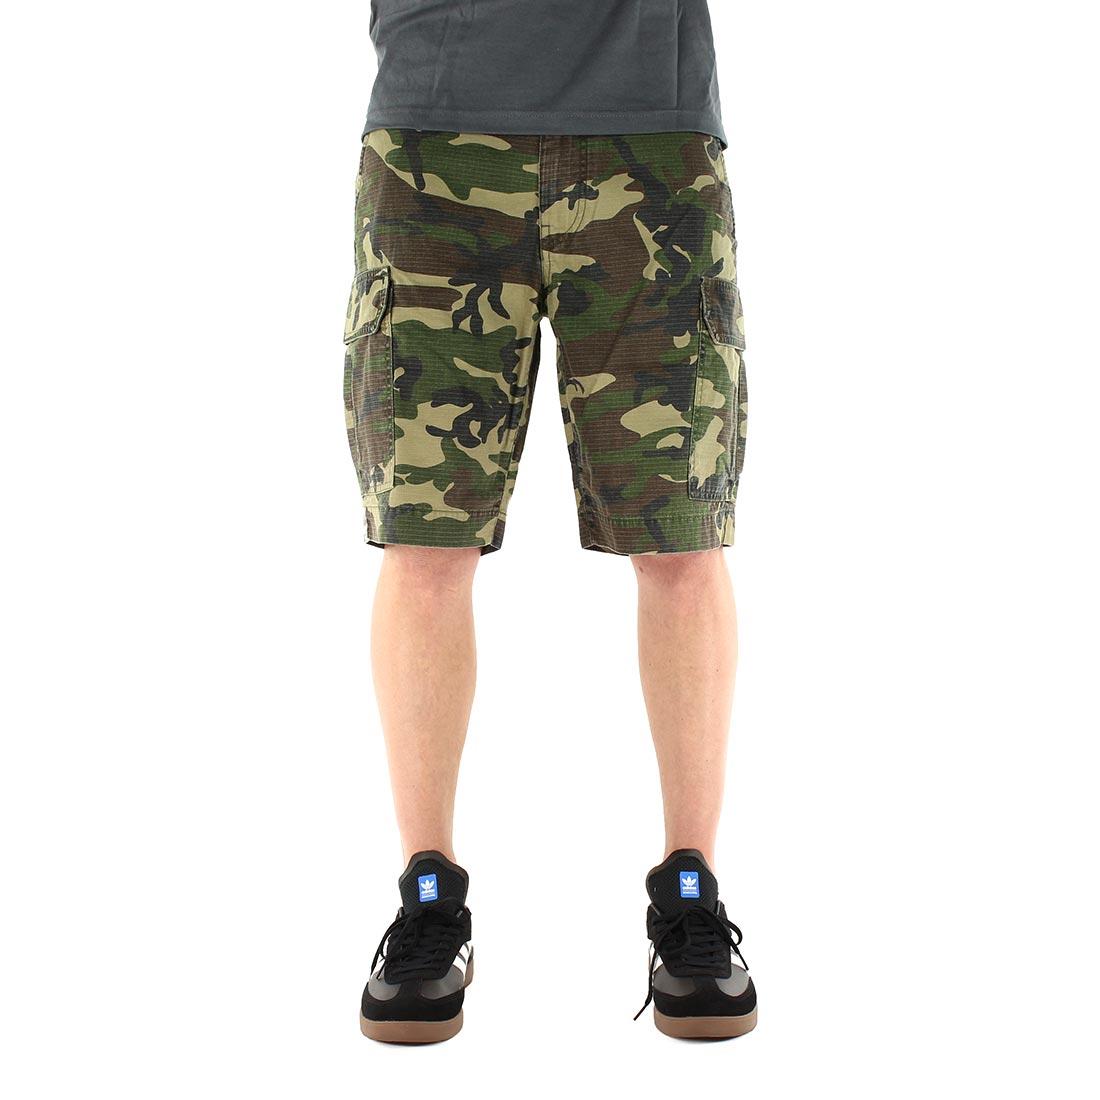 ca0cea6774 Dickies-New-York-Cargo-Short-Camouflage-03